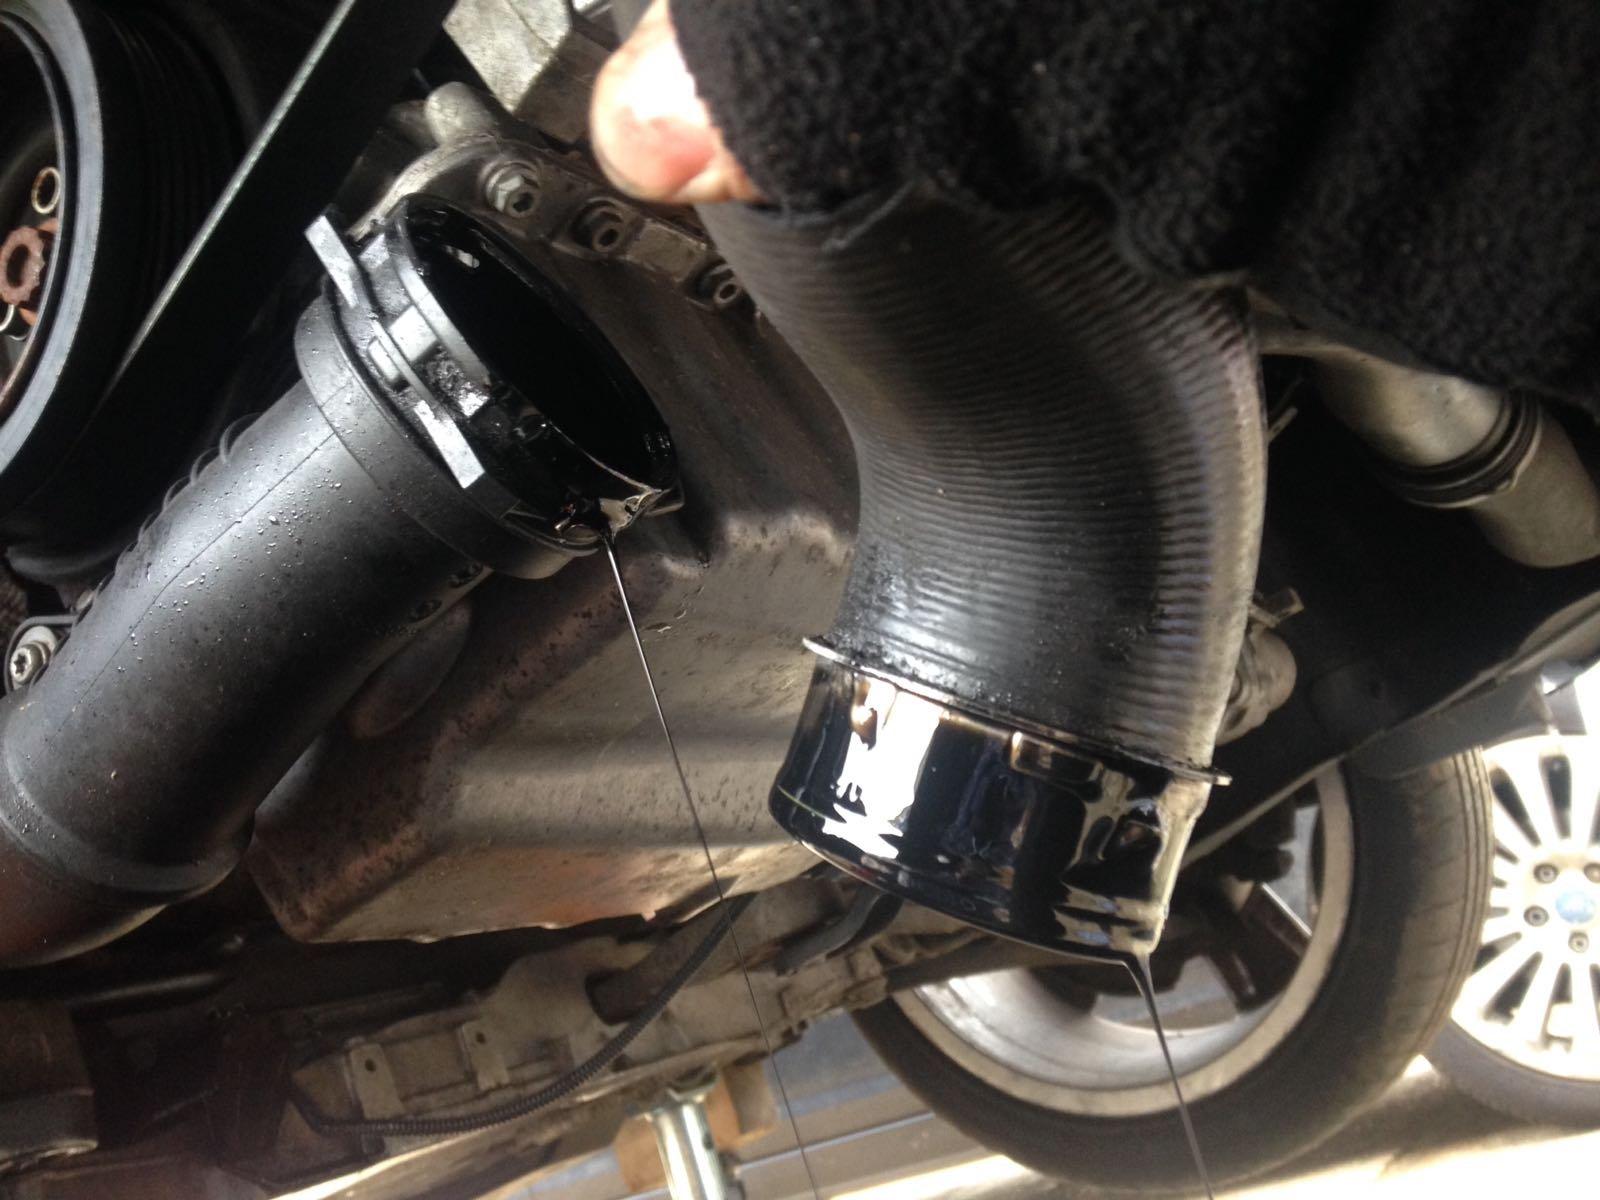 2 0 TDI Turbo Whine/Police Siren noise | Audi-Sport net